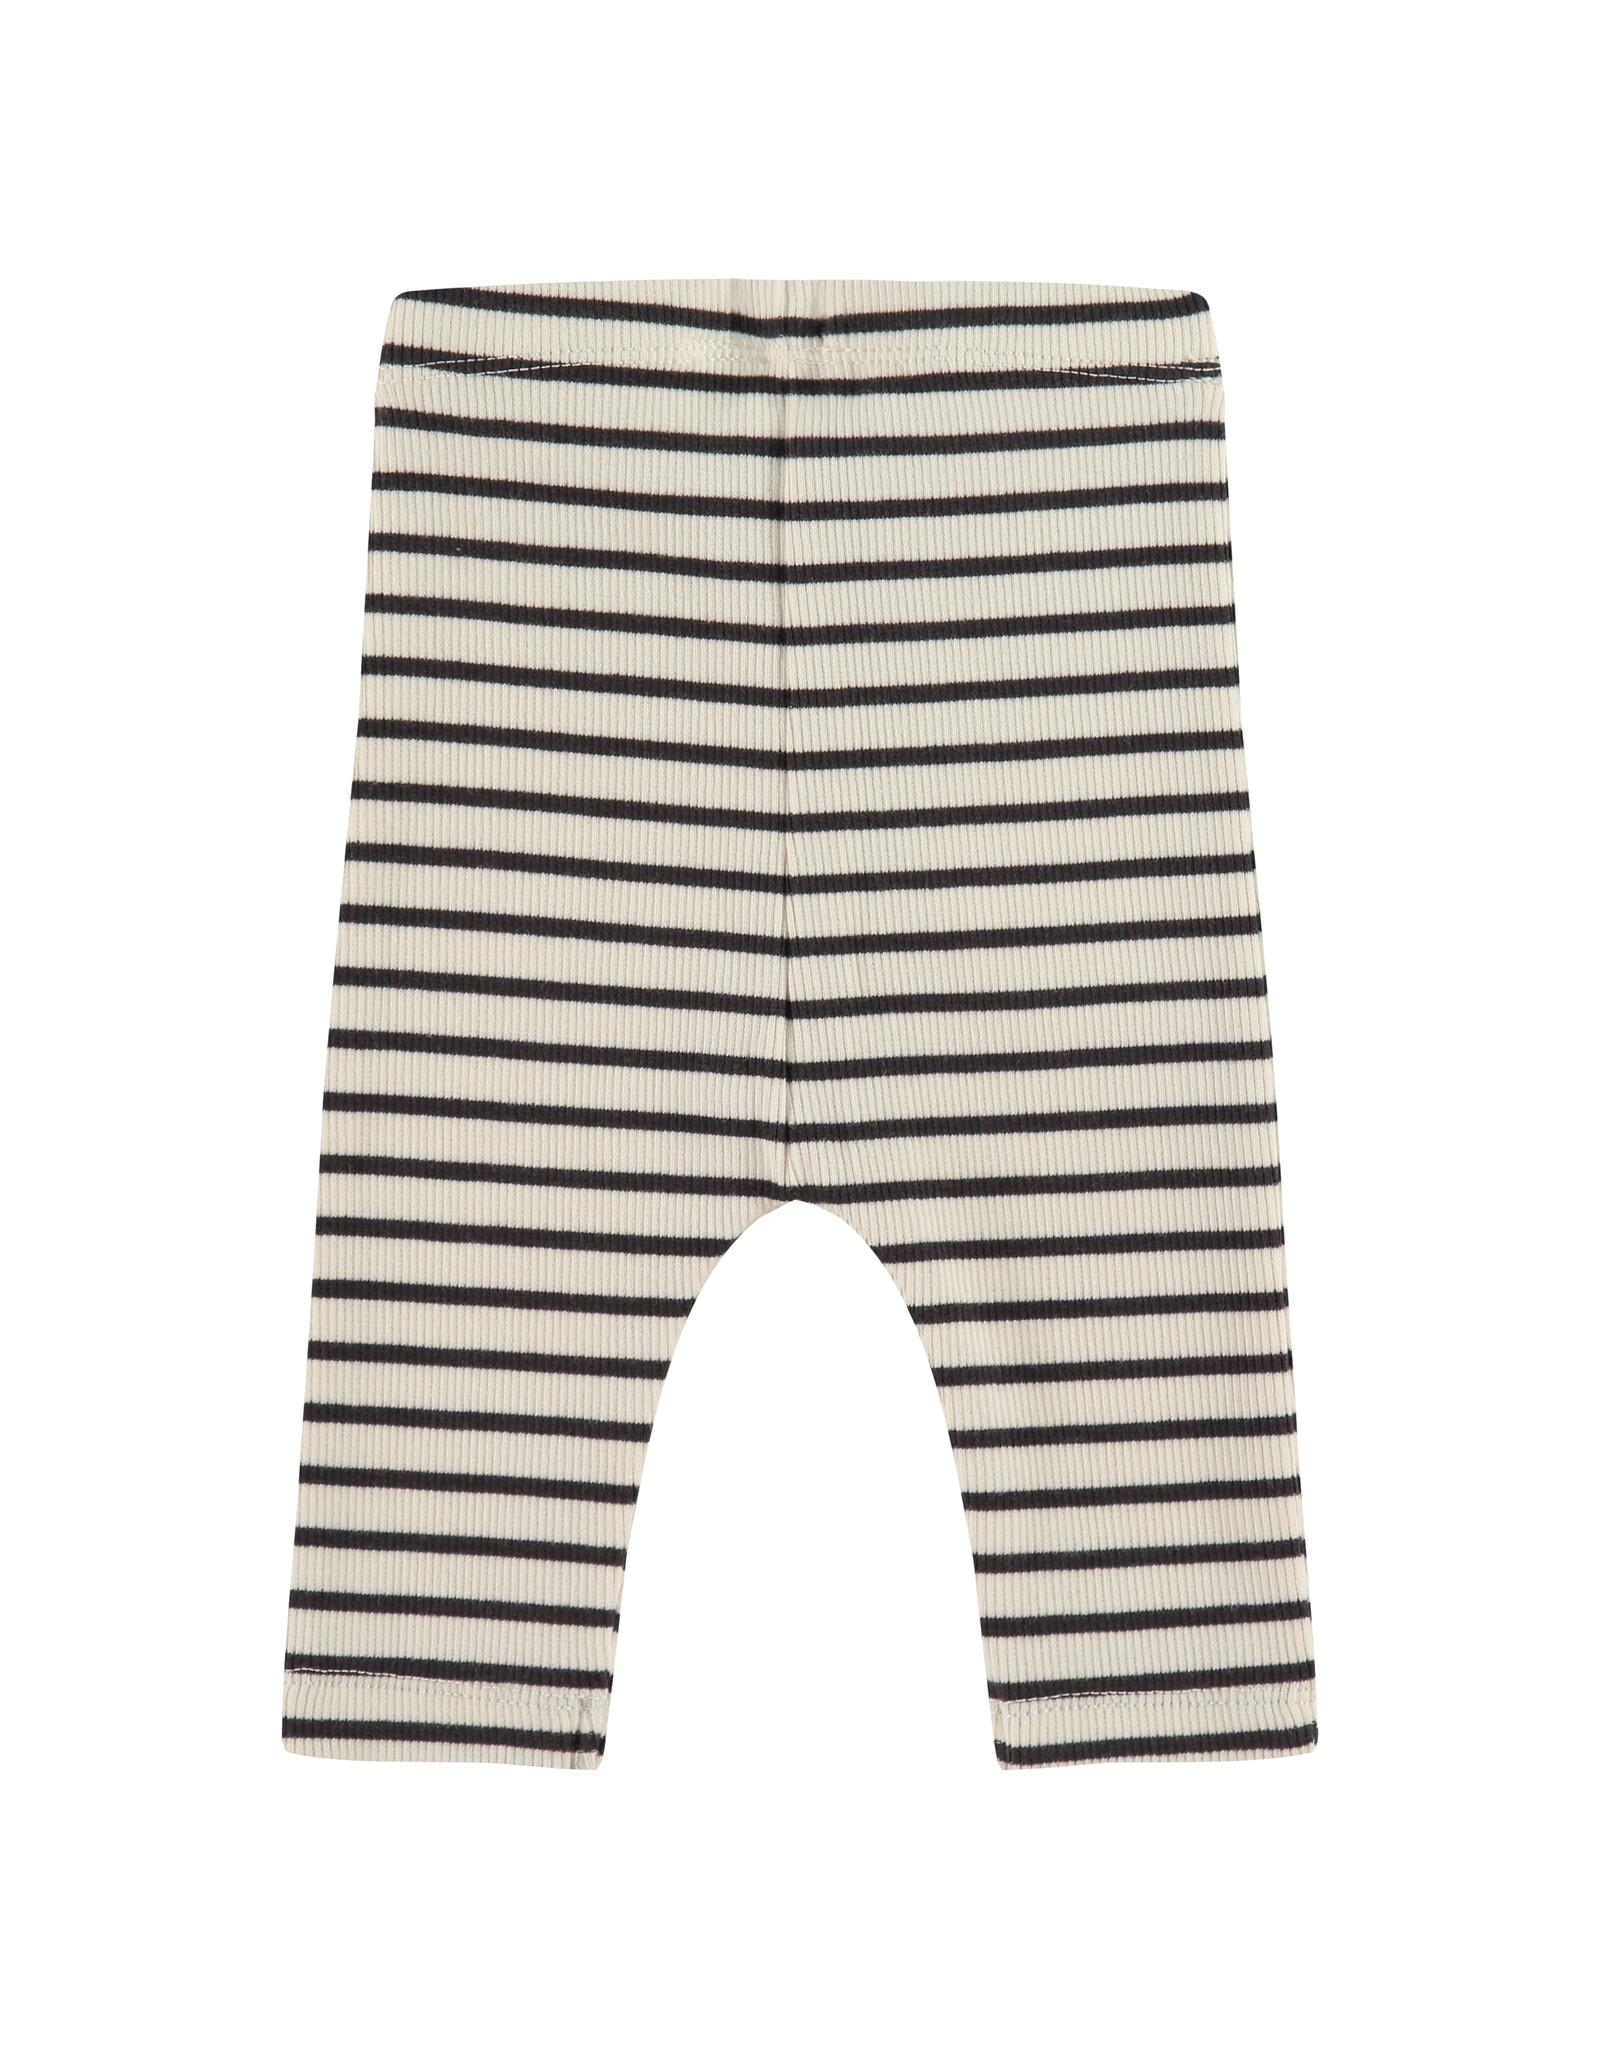 Babyface baby pants, ebony